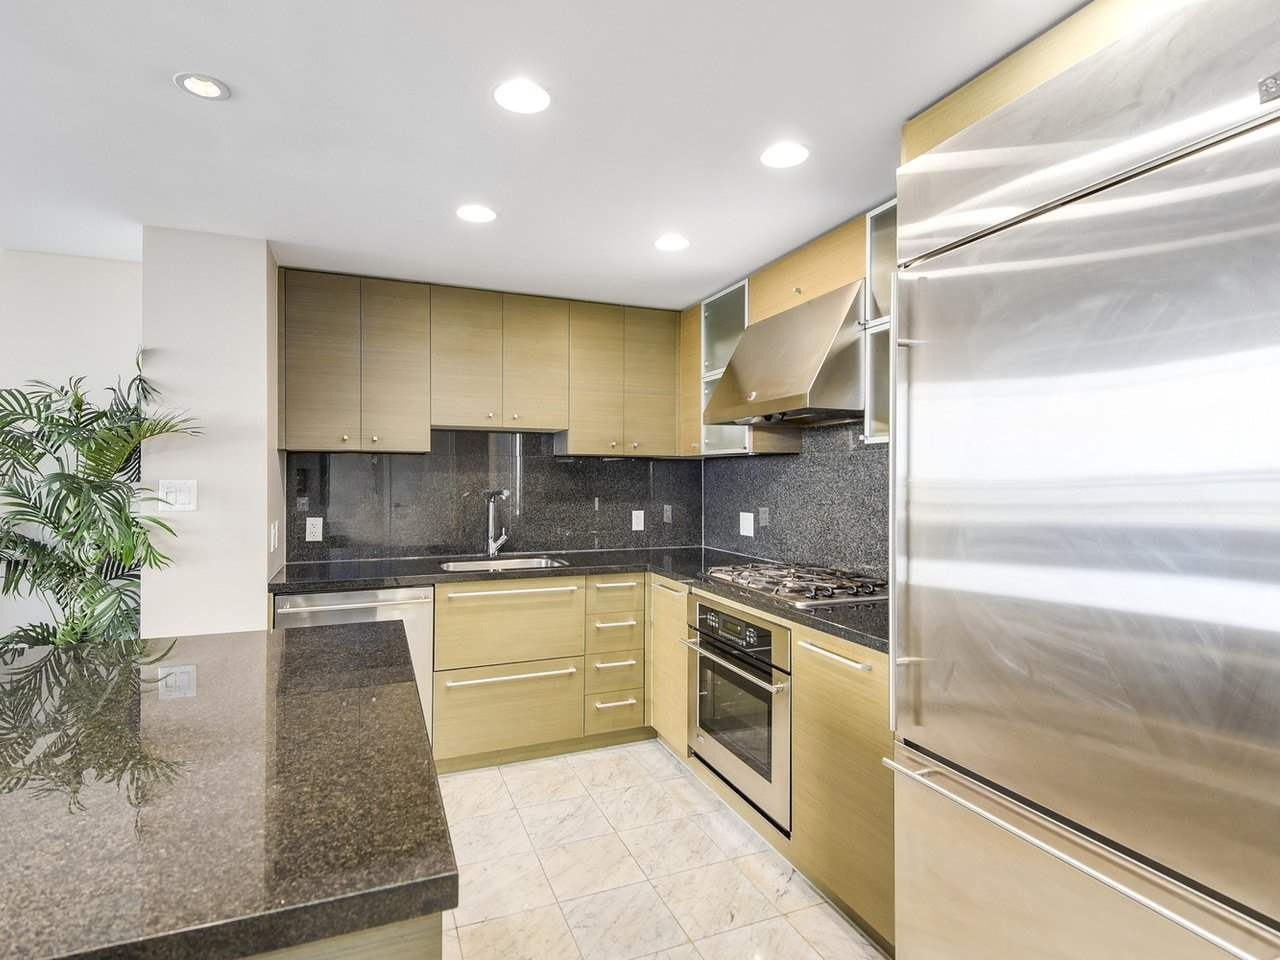 Condo Apartment at PH3 833 SEYMOUR STREET, Unit PH3, Vancouver West, British Columbia. Image 9